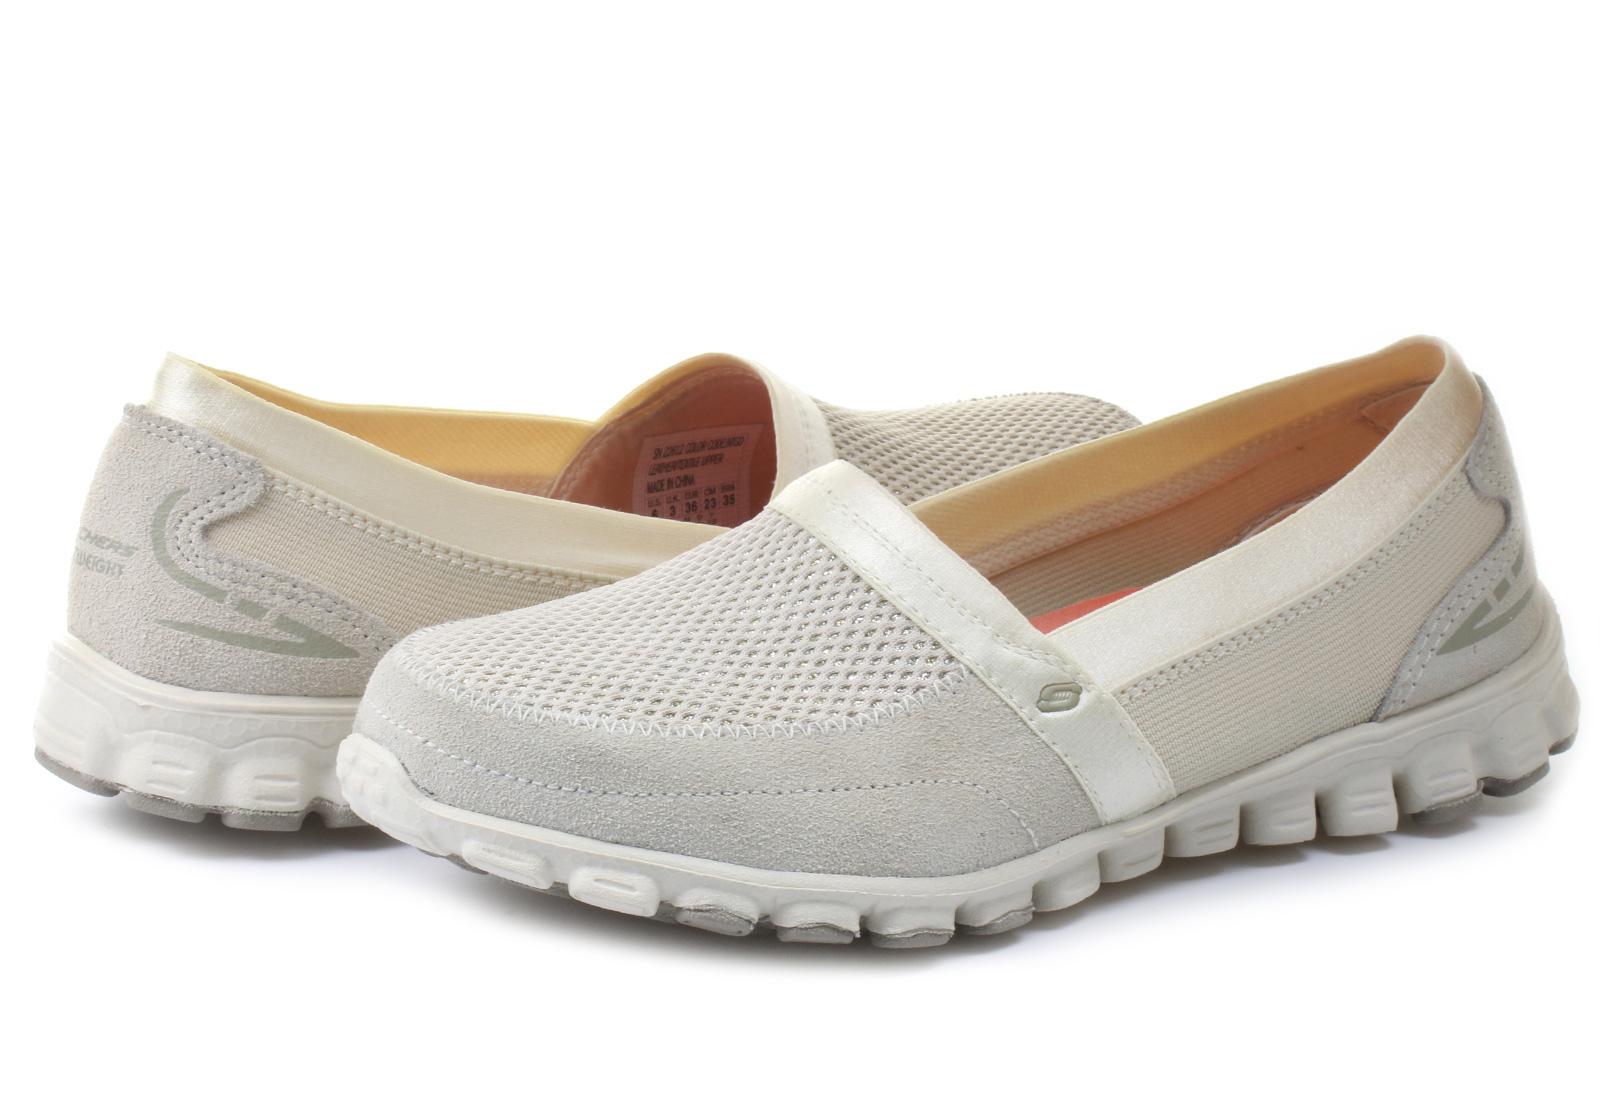 Skechers Cipő - Glitzy Glamour - 22612-ntgd - Office Shoes Magyarország 2a79120bc3